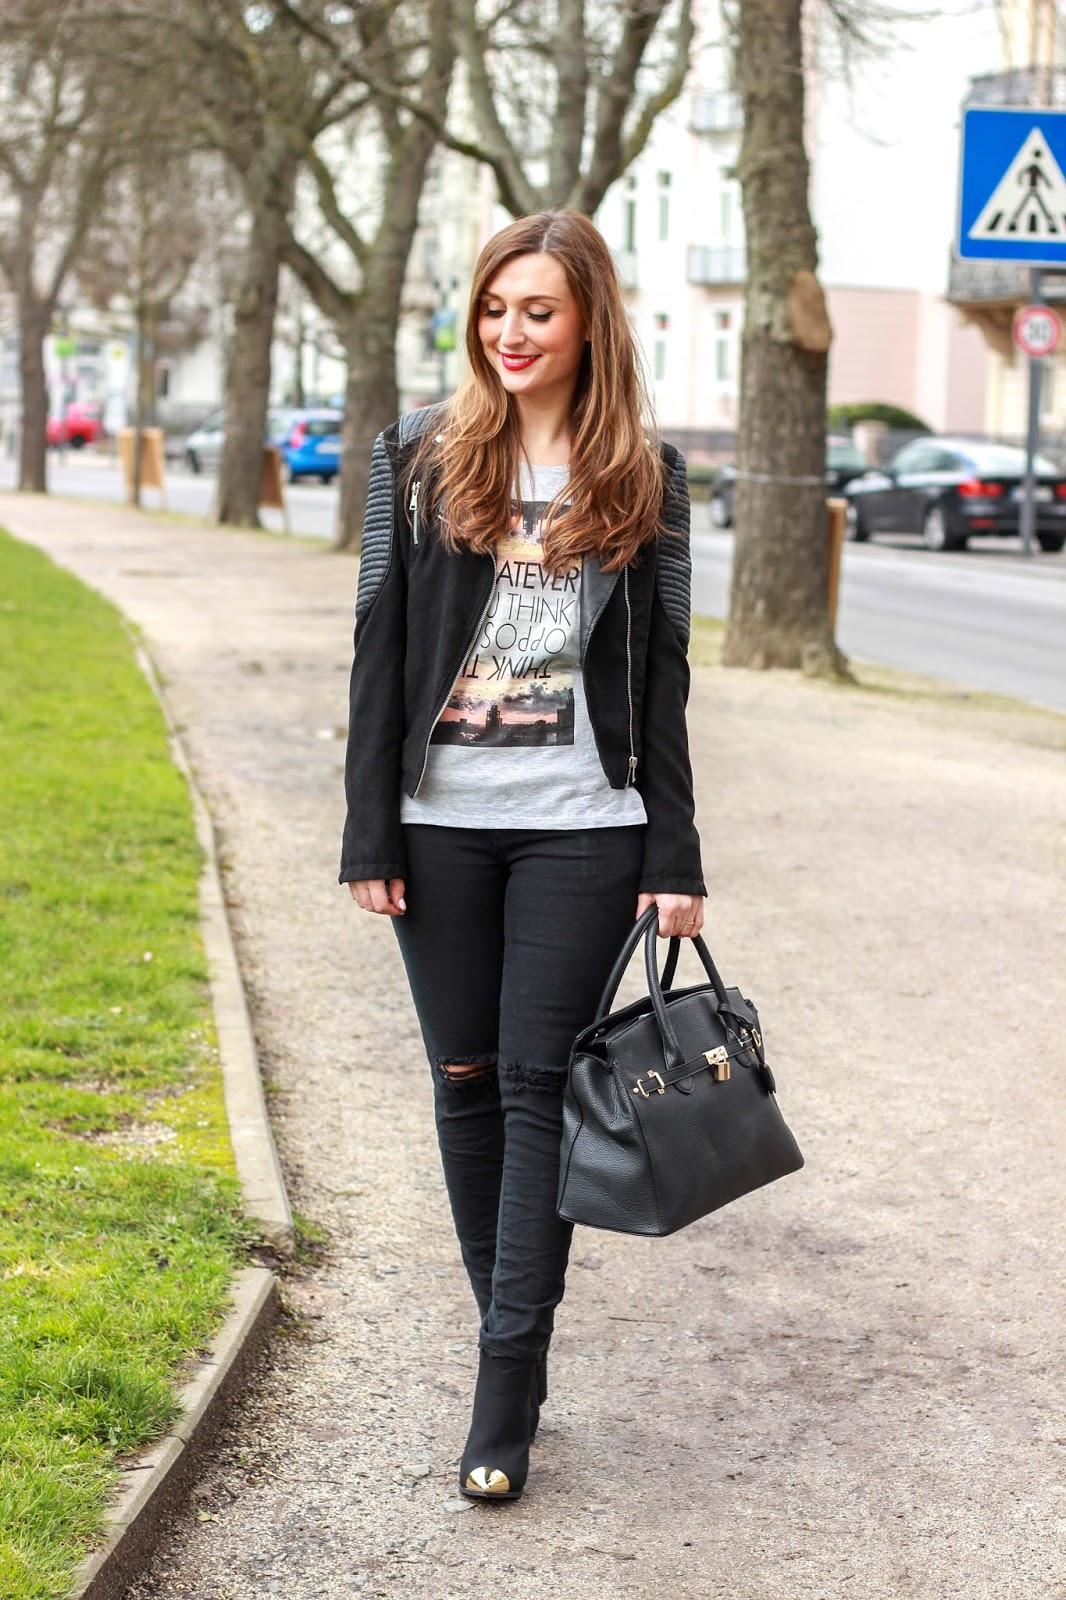 Deutsche Fashionblogger - Lederjacke - Streetstyle - Streetstyleinspiration - My Colloseum - Frankfurt Fashionblogger - Fashionblogger aus Frankfurt - Deutsche Fashionblogger